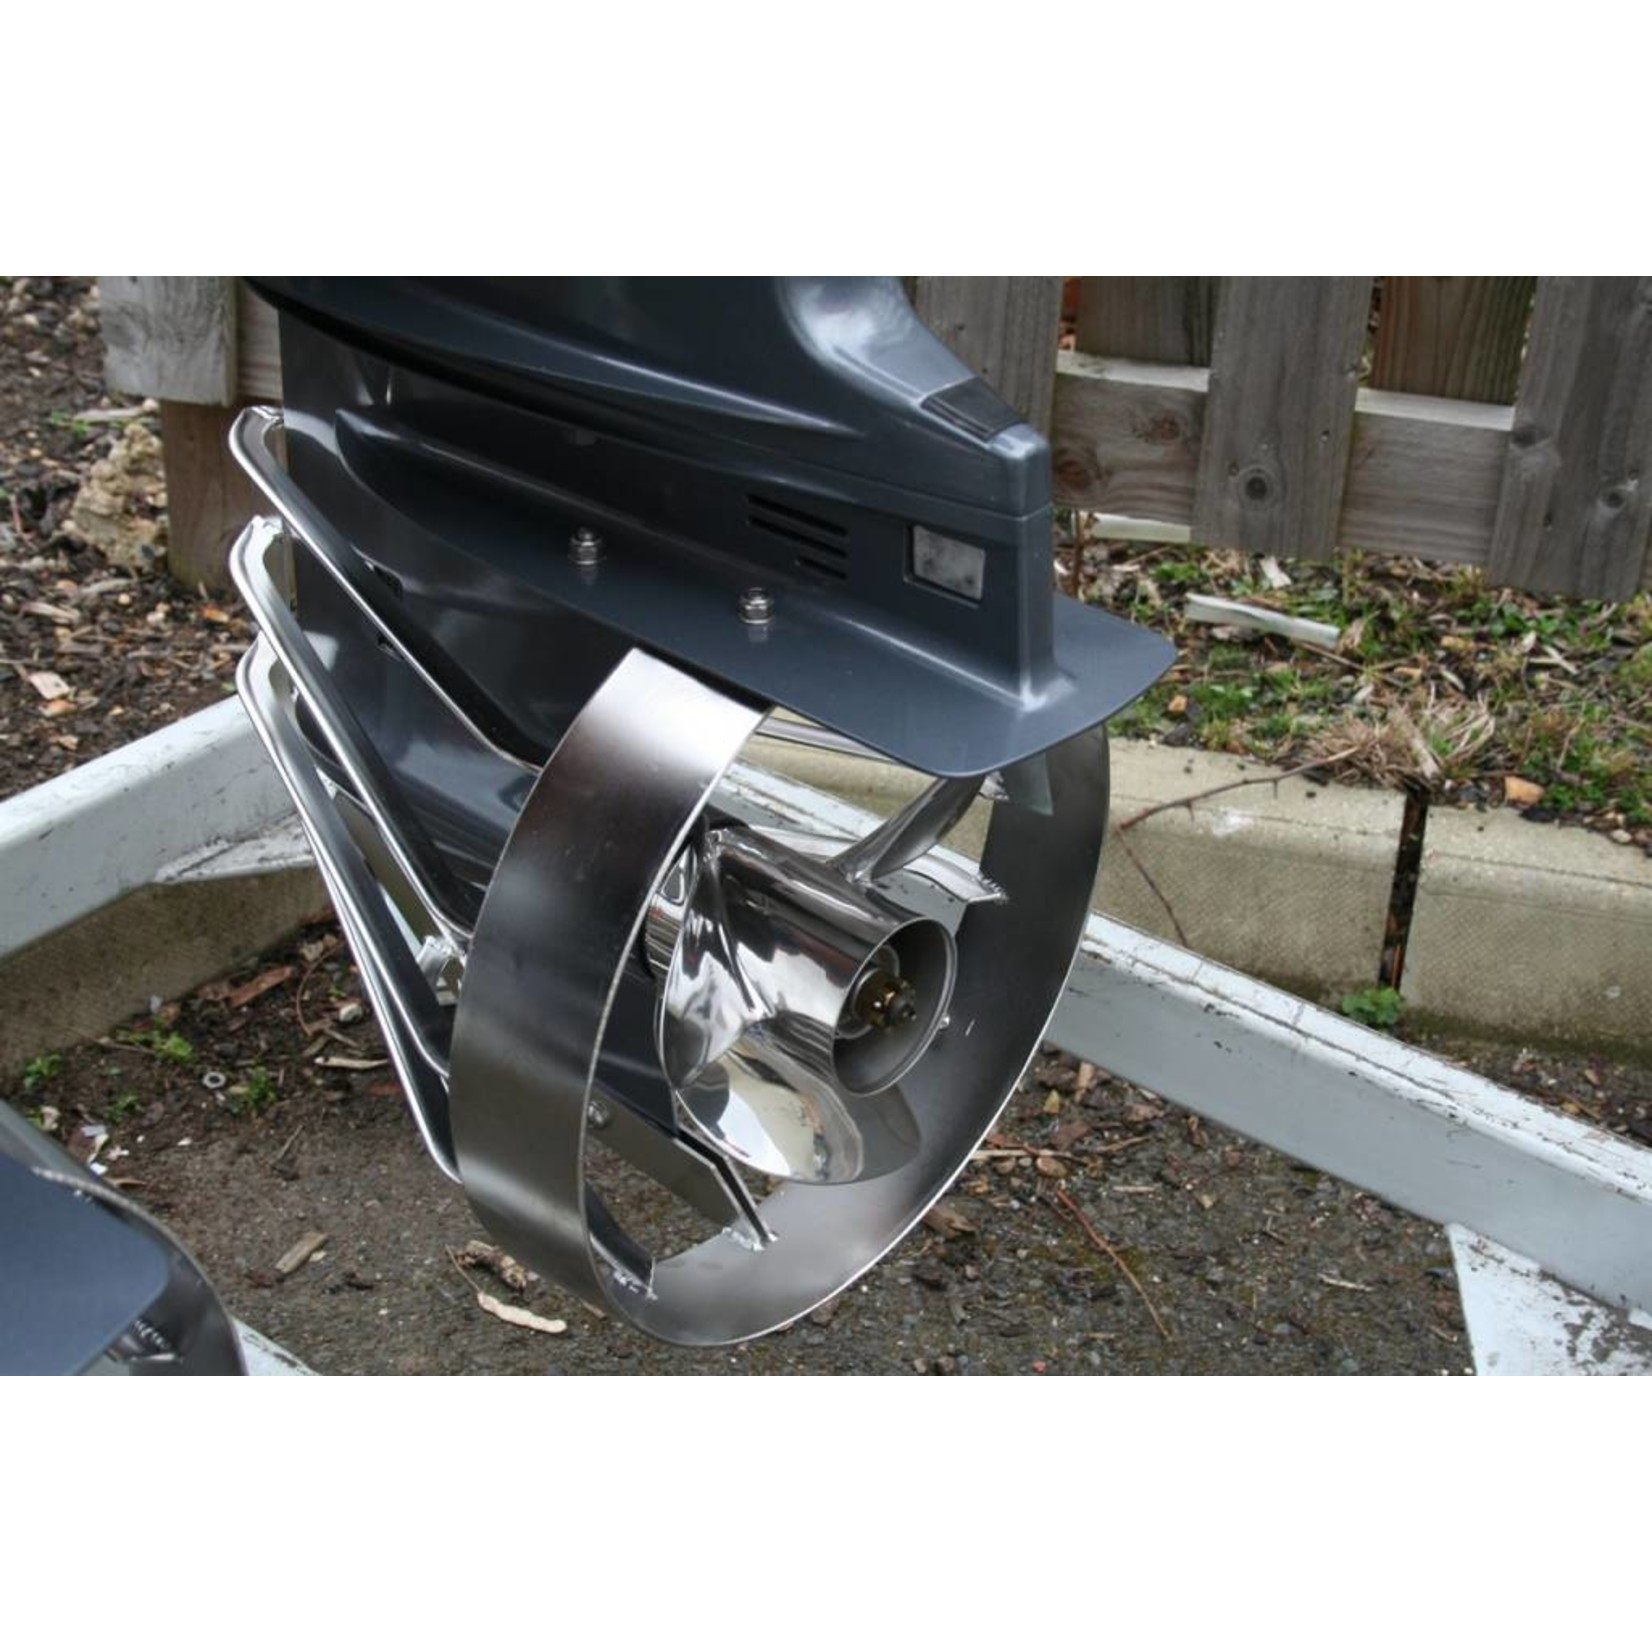 Prop Deflector Prop Deflector - Propeller ring